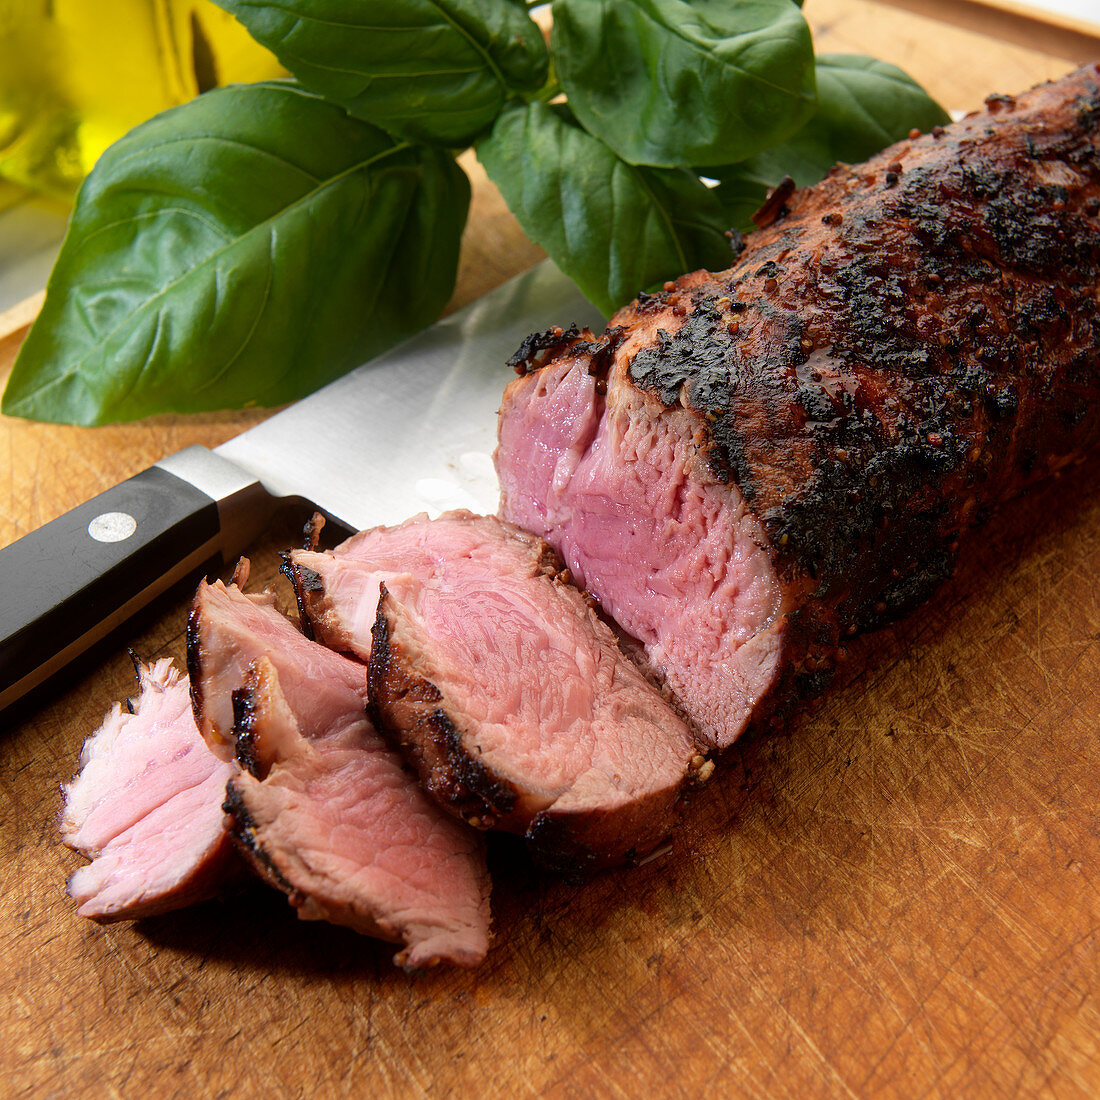 Sliced grilled pork tenderloin with herb rub